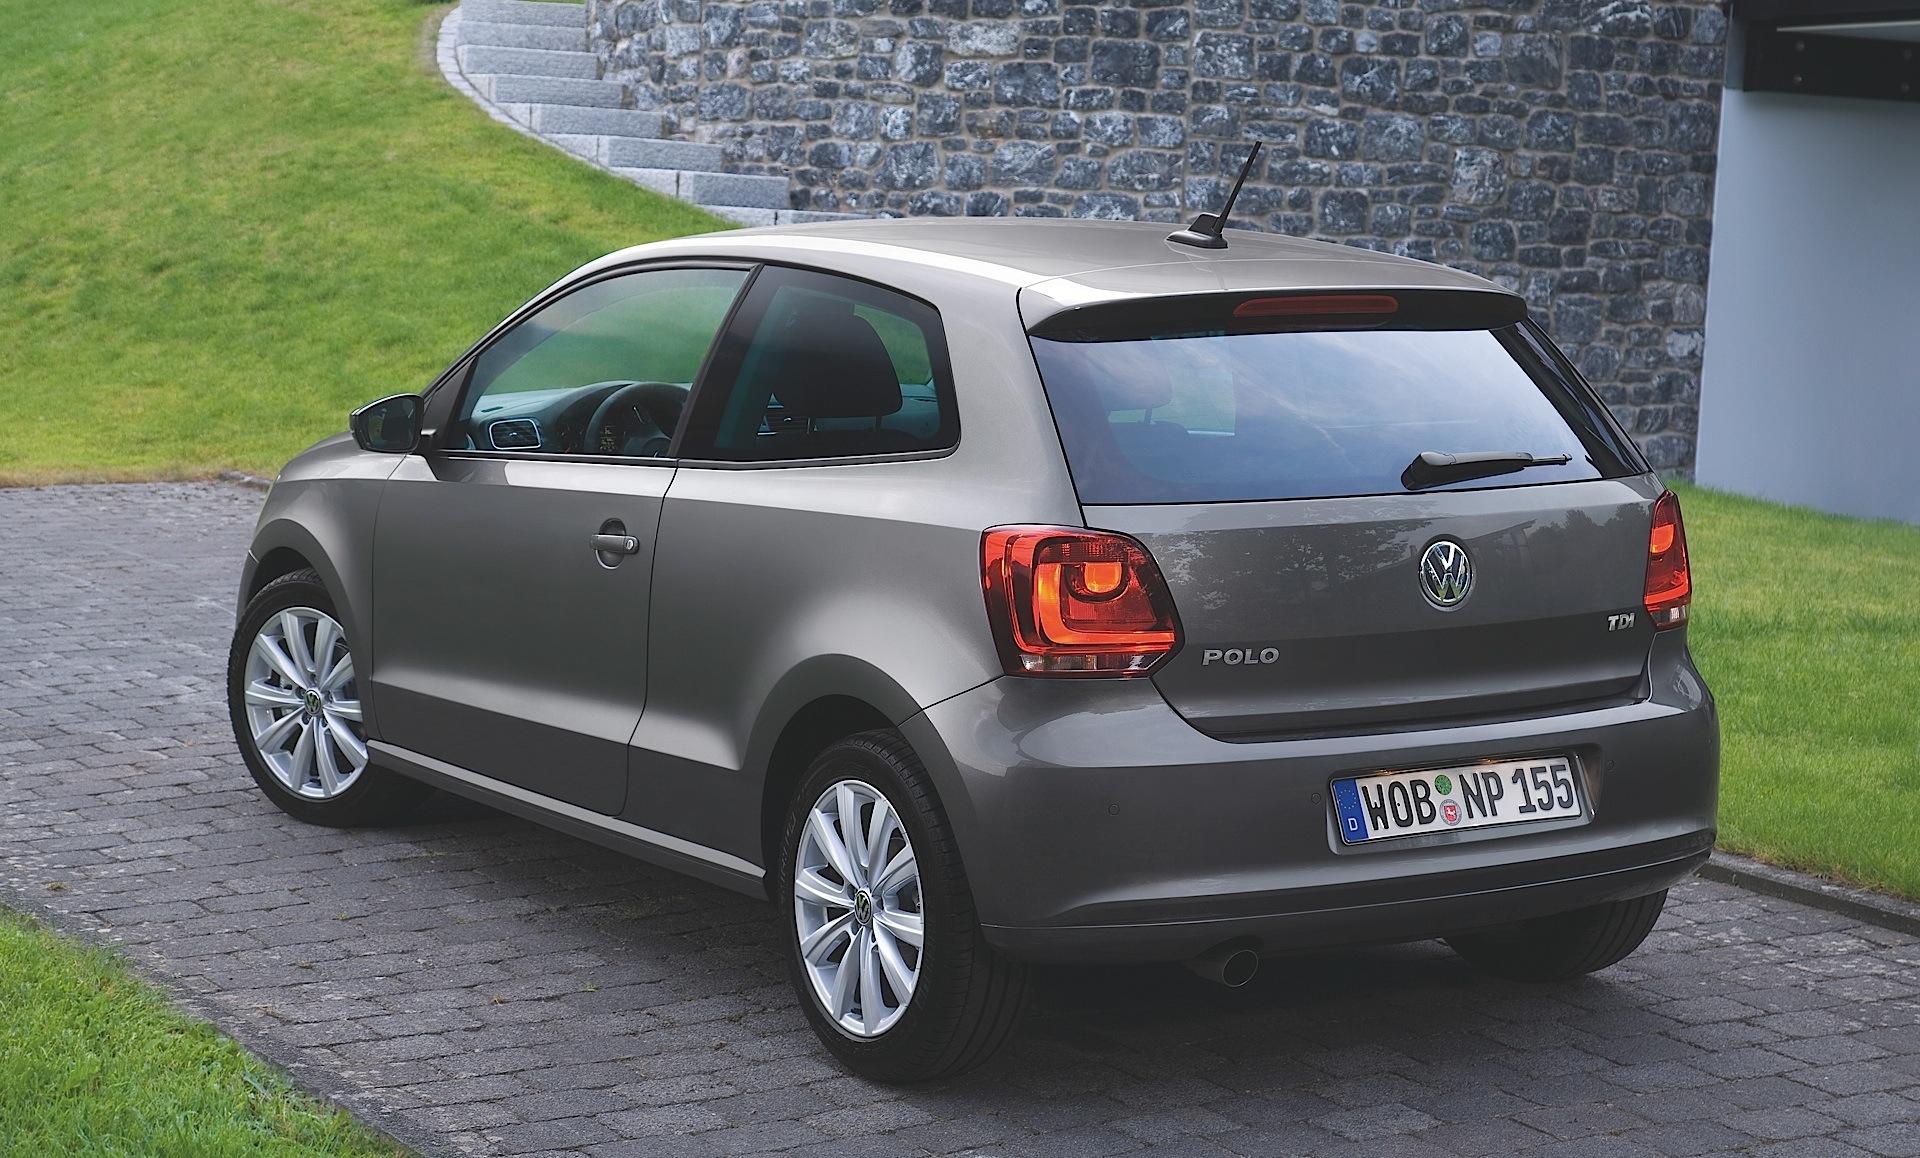 volkswagen polo 3 doors specs 2009 2010 2011 2012 2013 2014 autoevolution. Black Bedroom Furniture Sets. Home Design Ideas